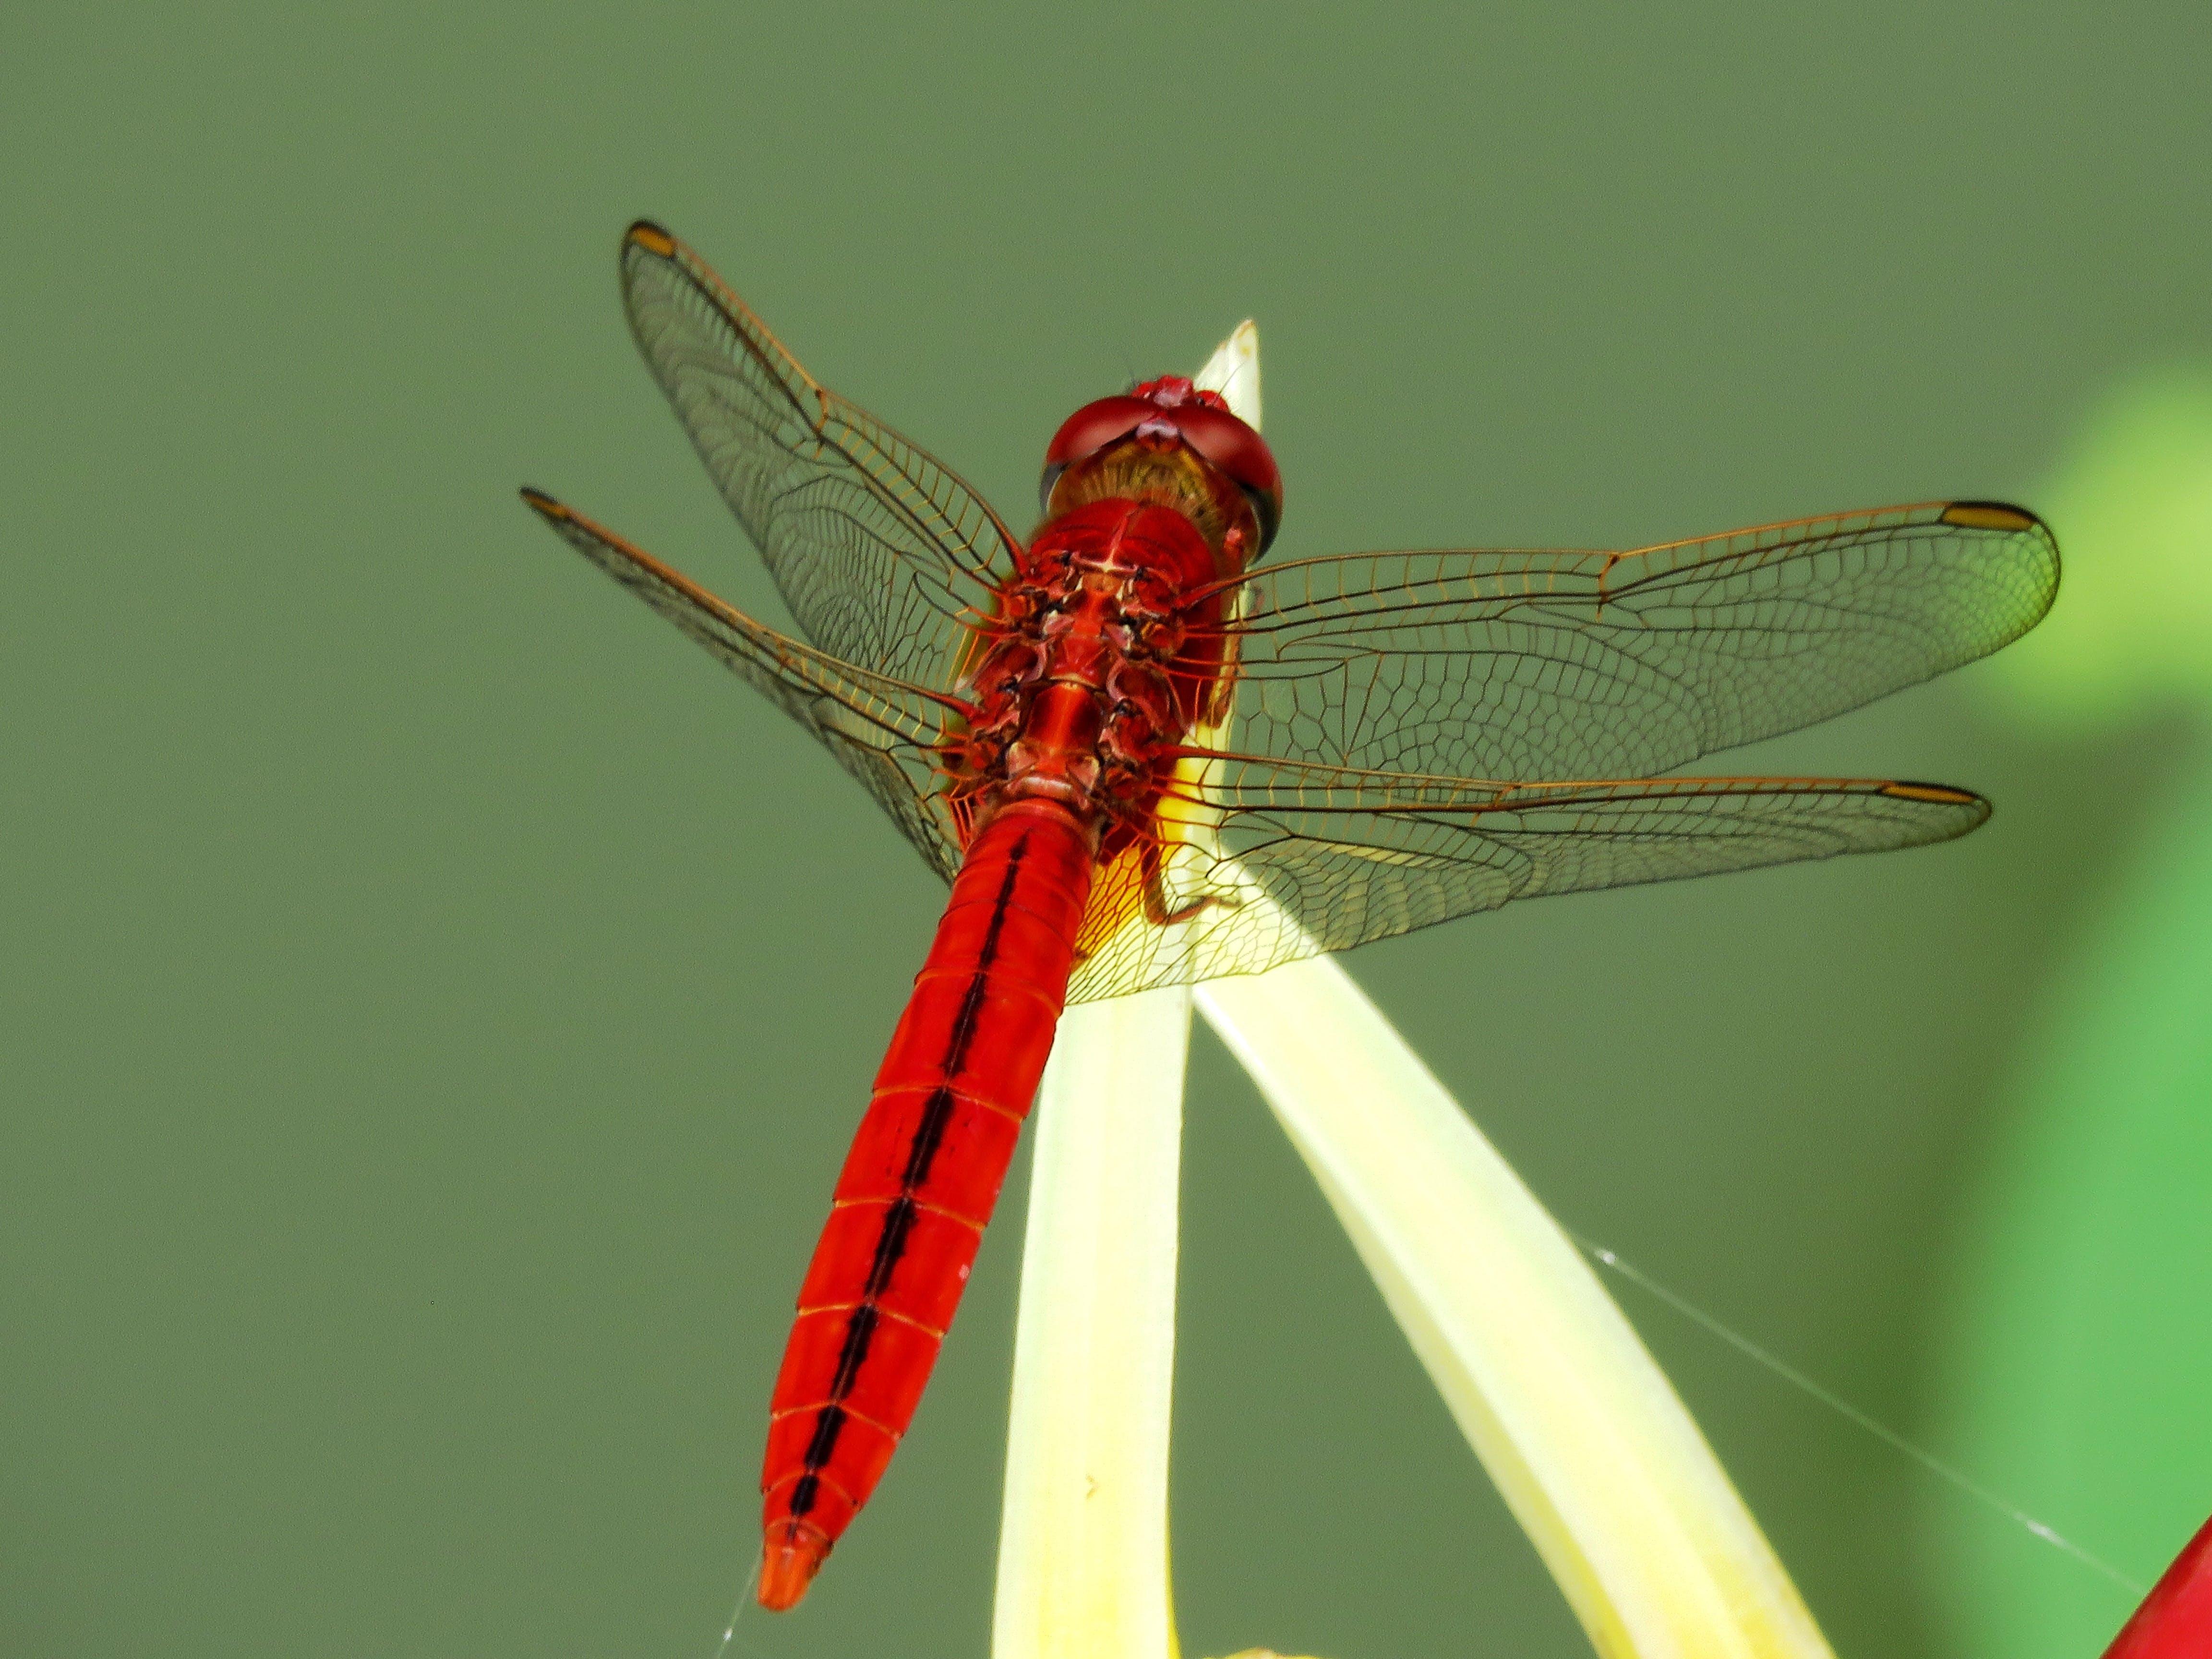 Free stock photo of nature, red, yellow, animal